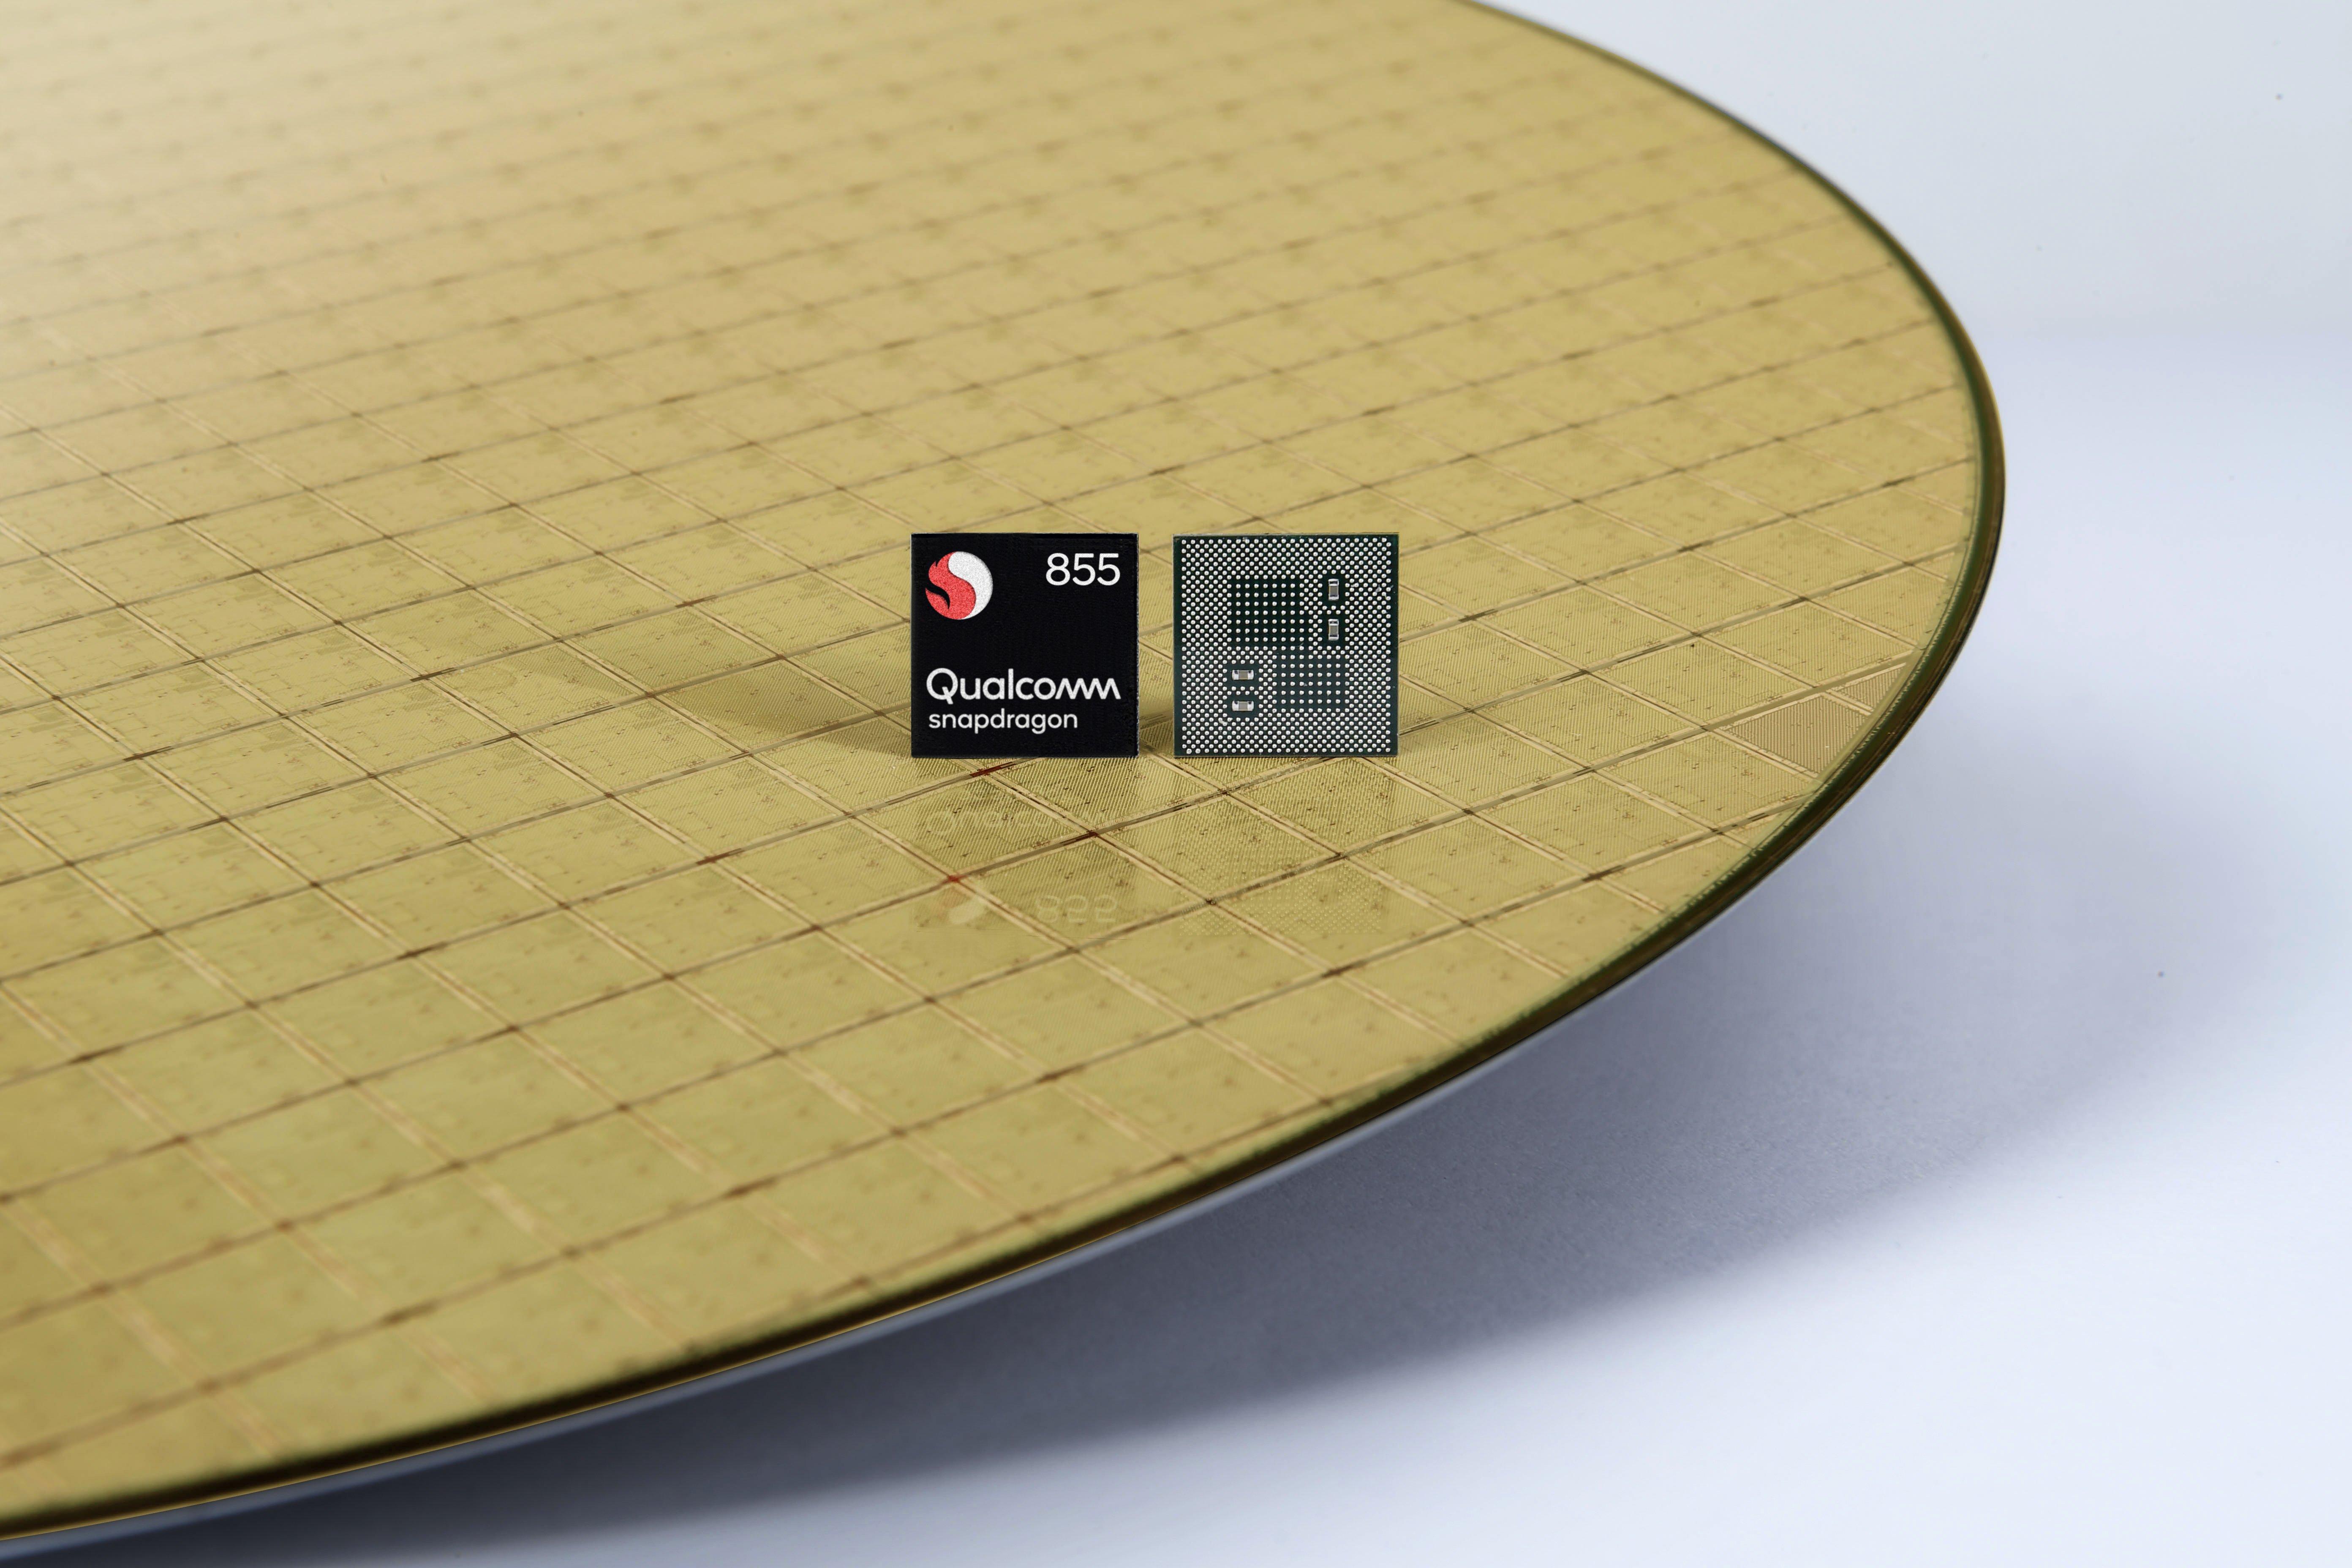 Qualcomm Snapdragon 865 Prozessor mit integriertem 5G-Modem